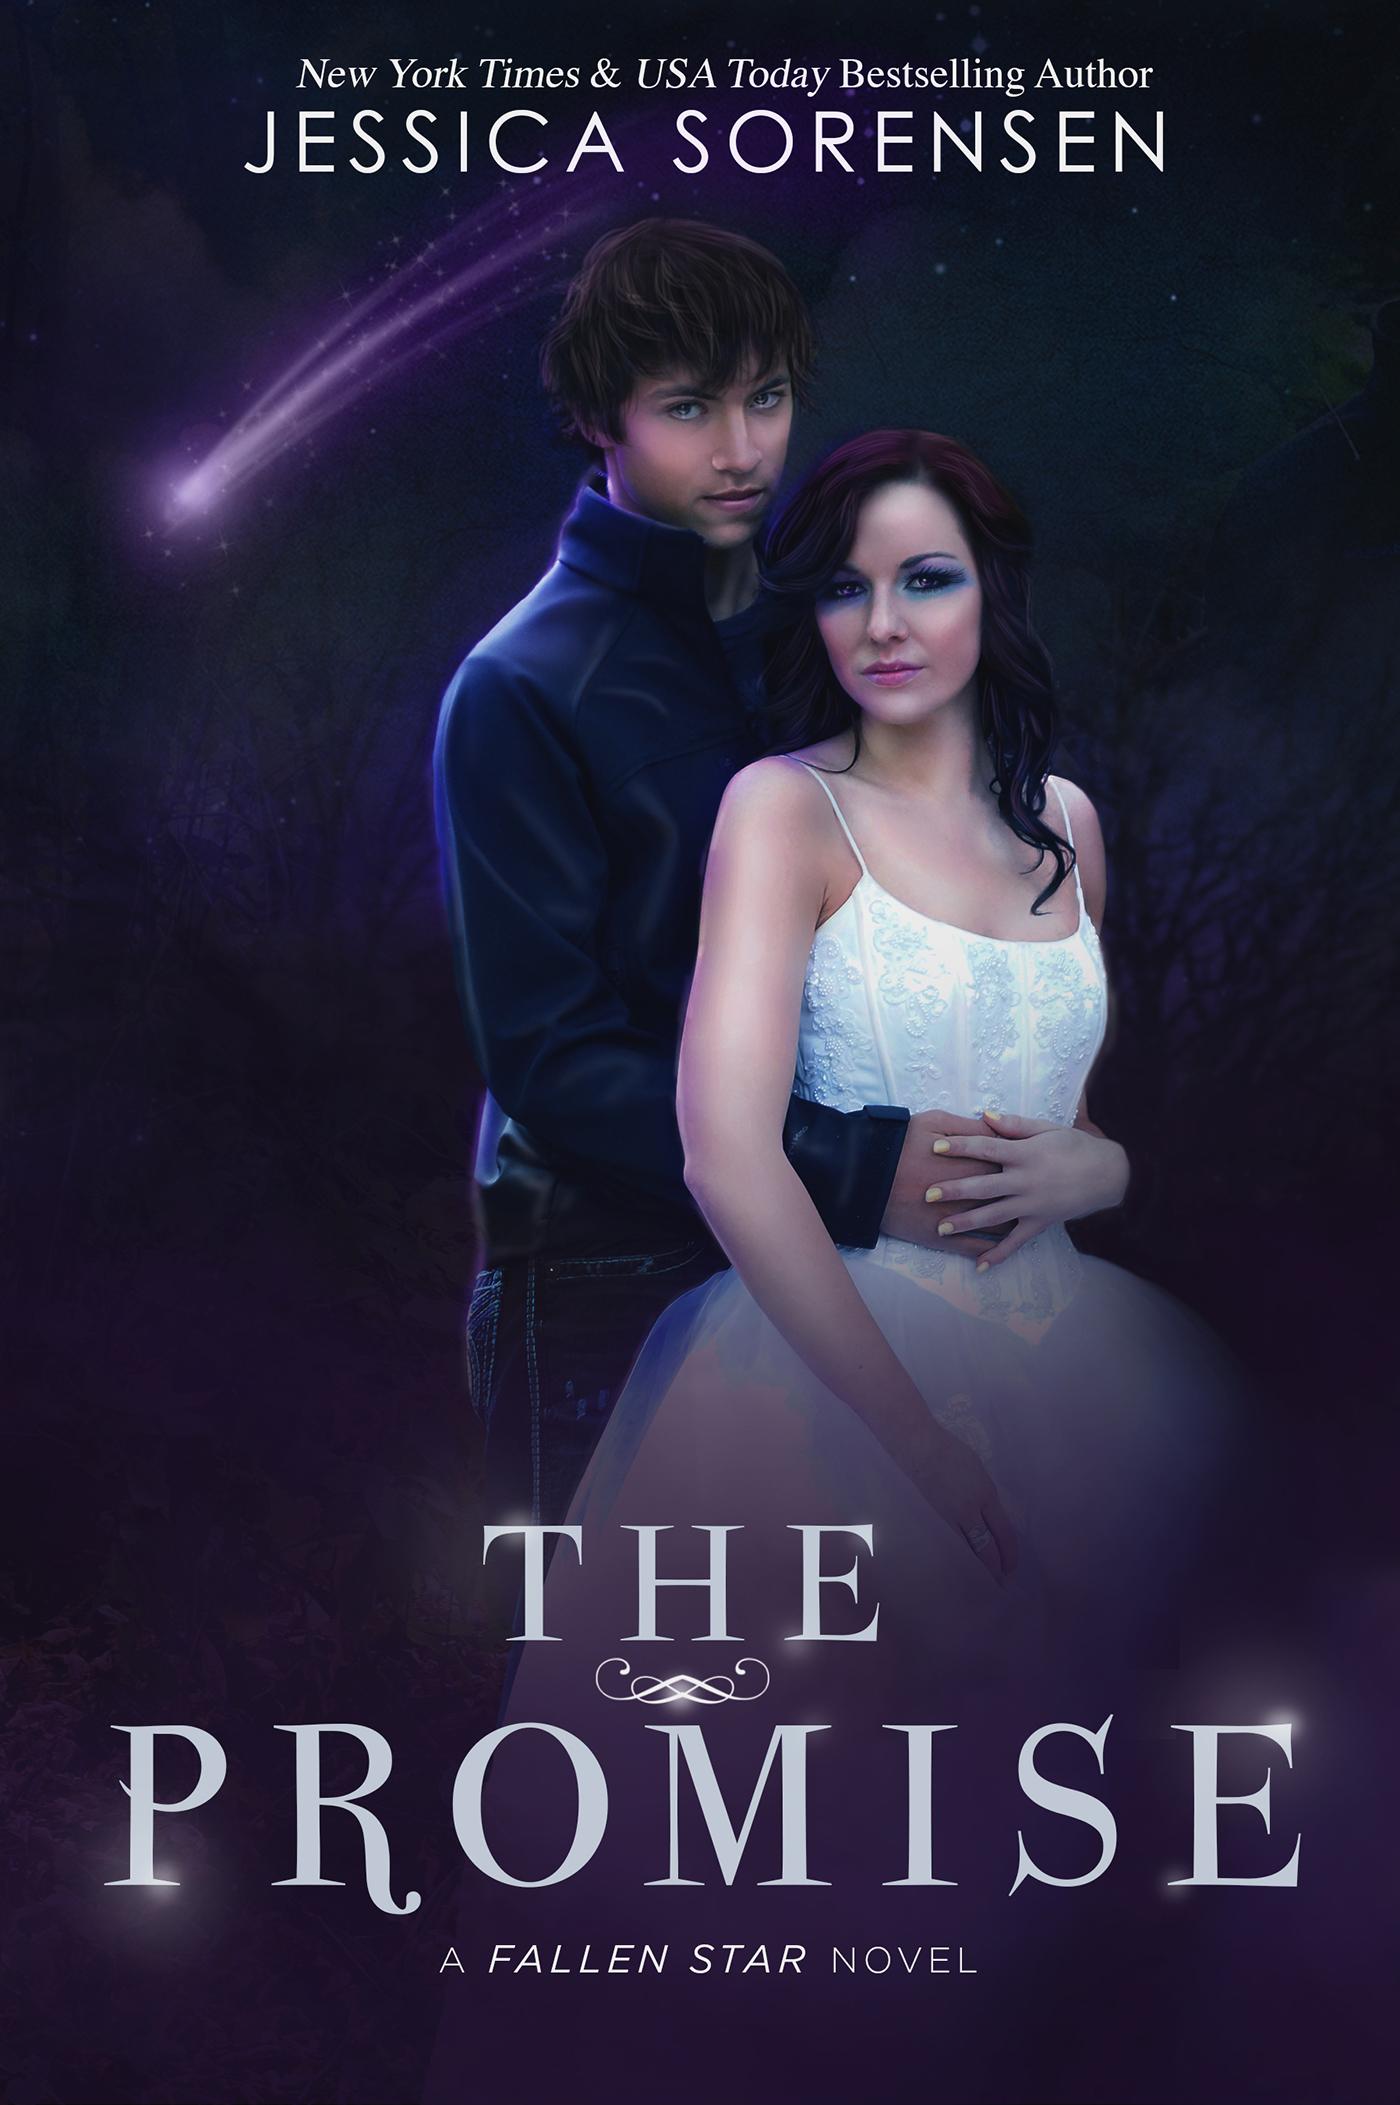 Jessica Sorensen - The Promise (Fallen Star Series, Book 4)